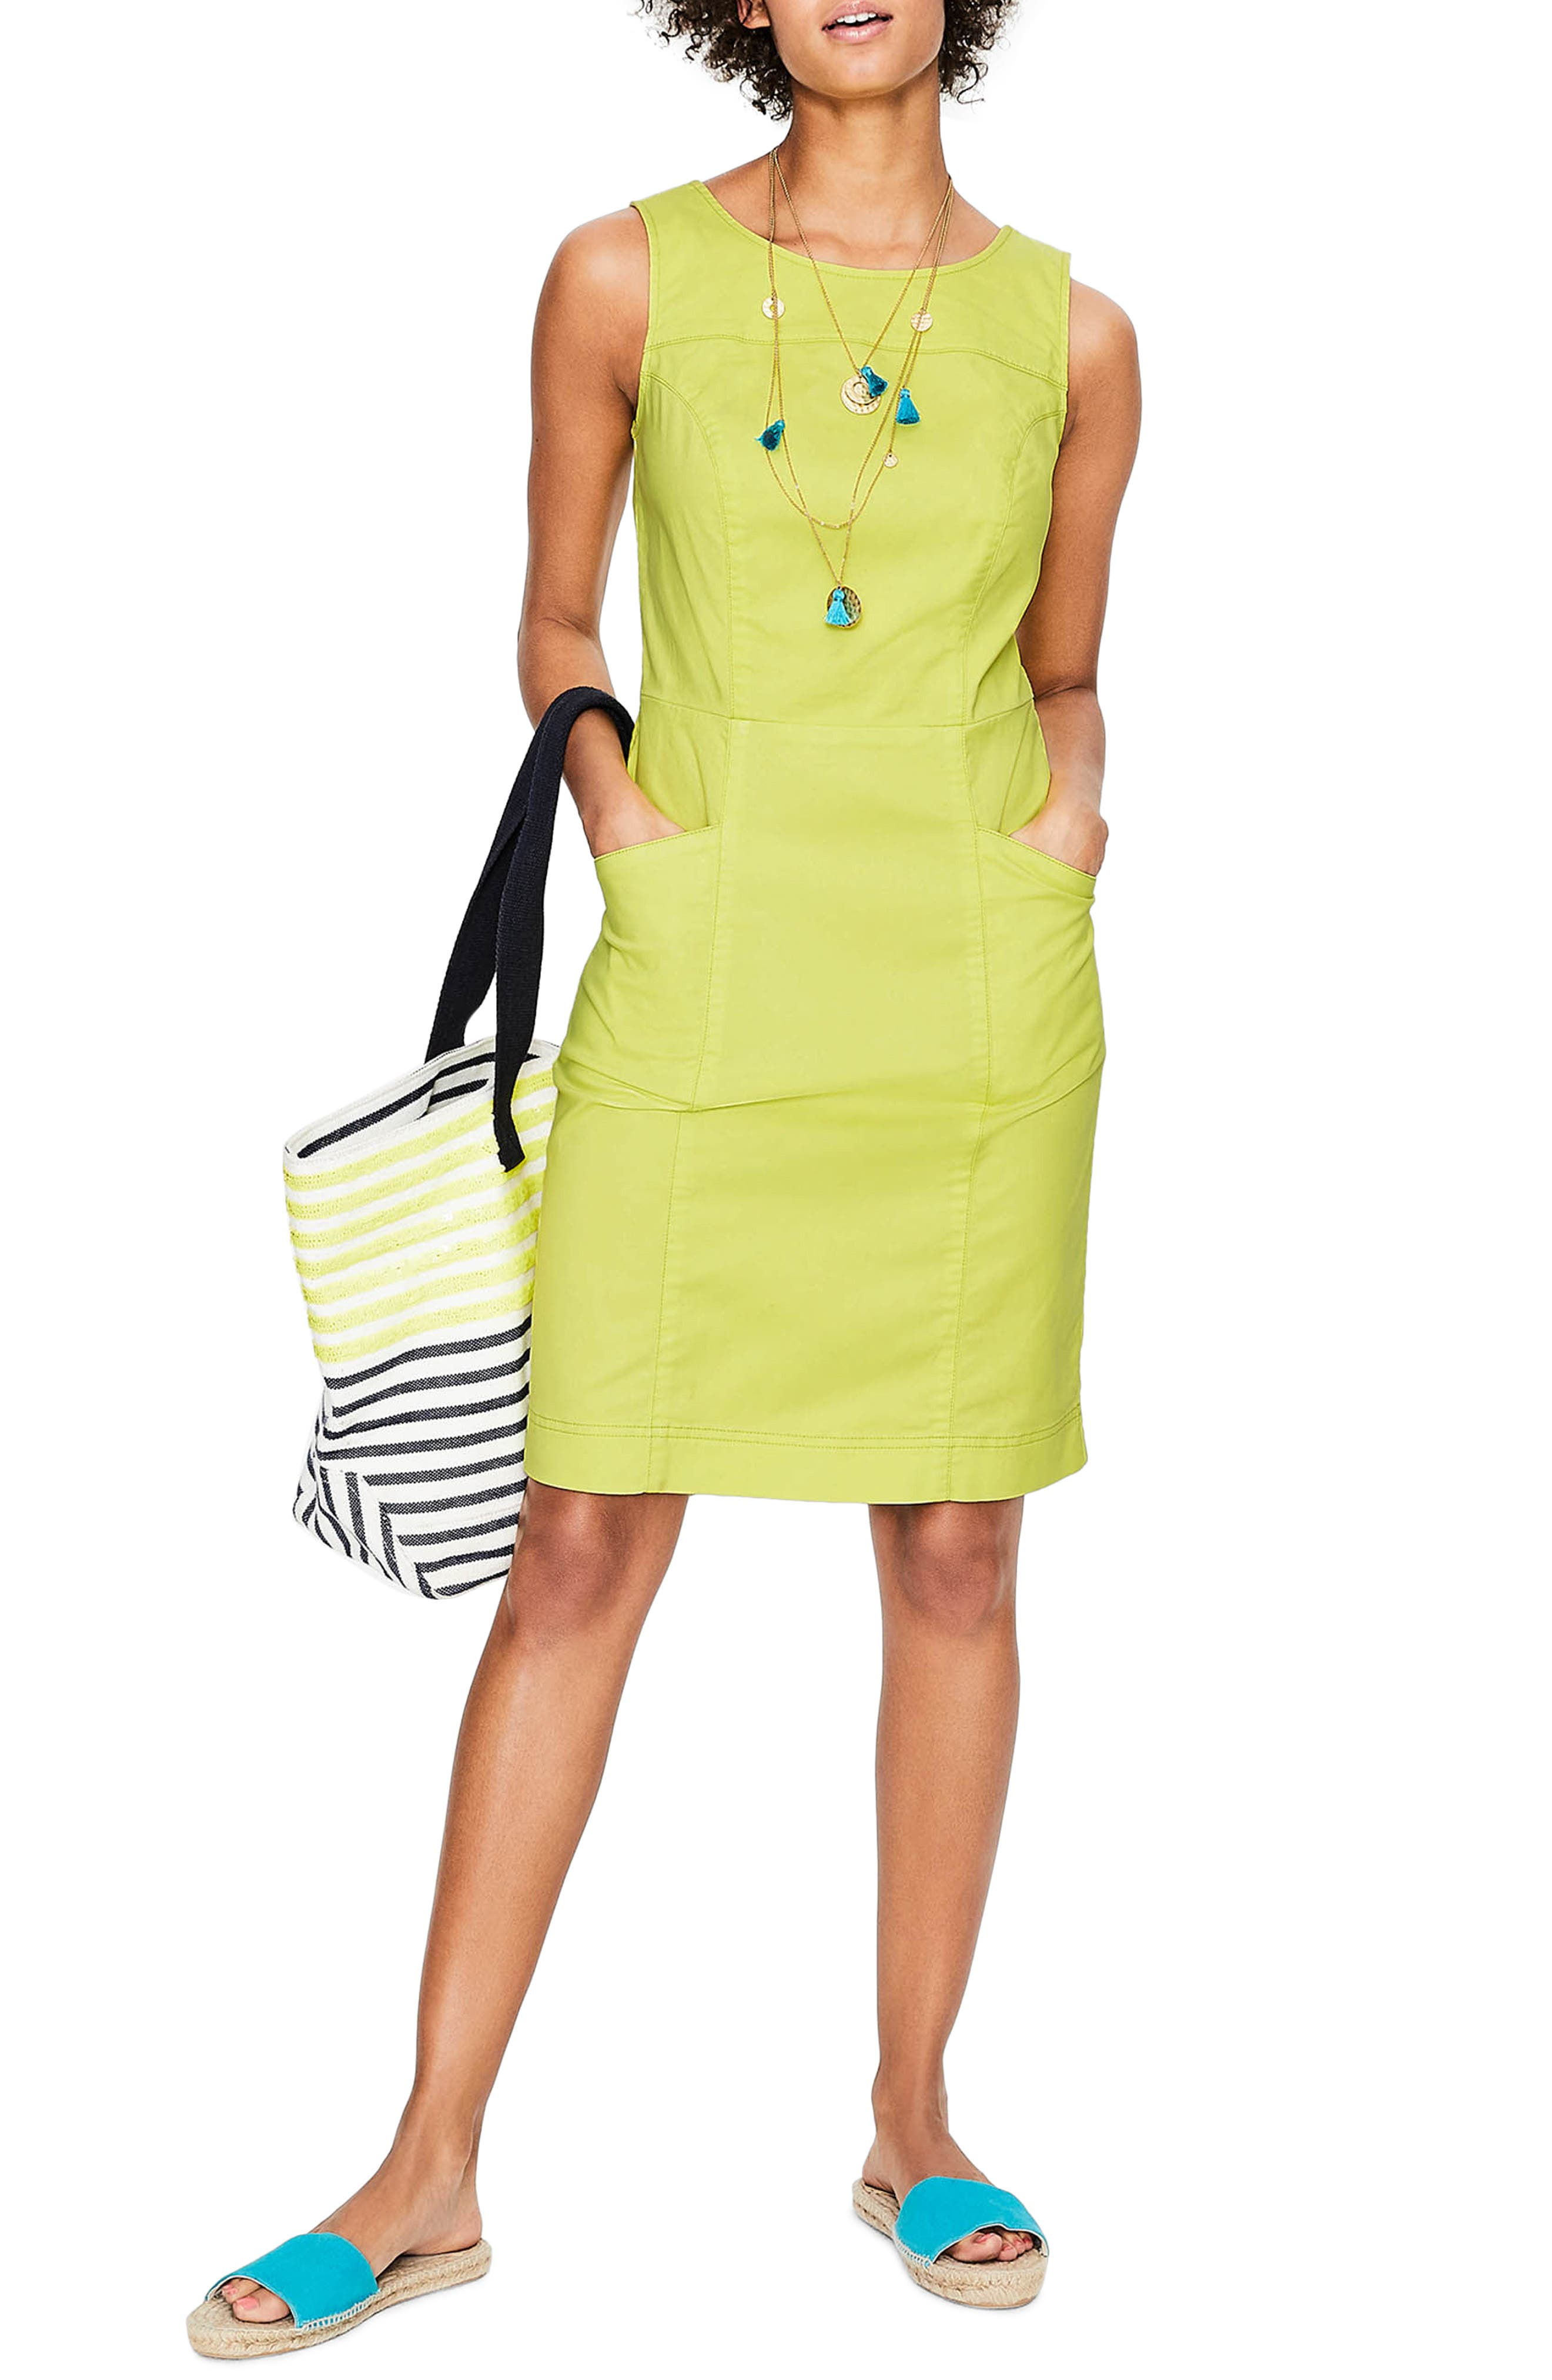 Tamara Stretch Cotton Sleeveless Dress,                             Main thumbnail 1, color,                             Citrus